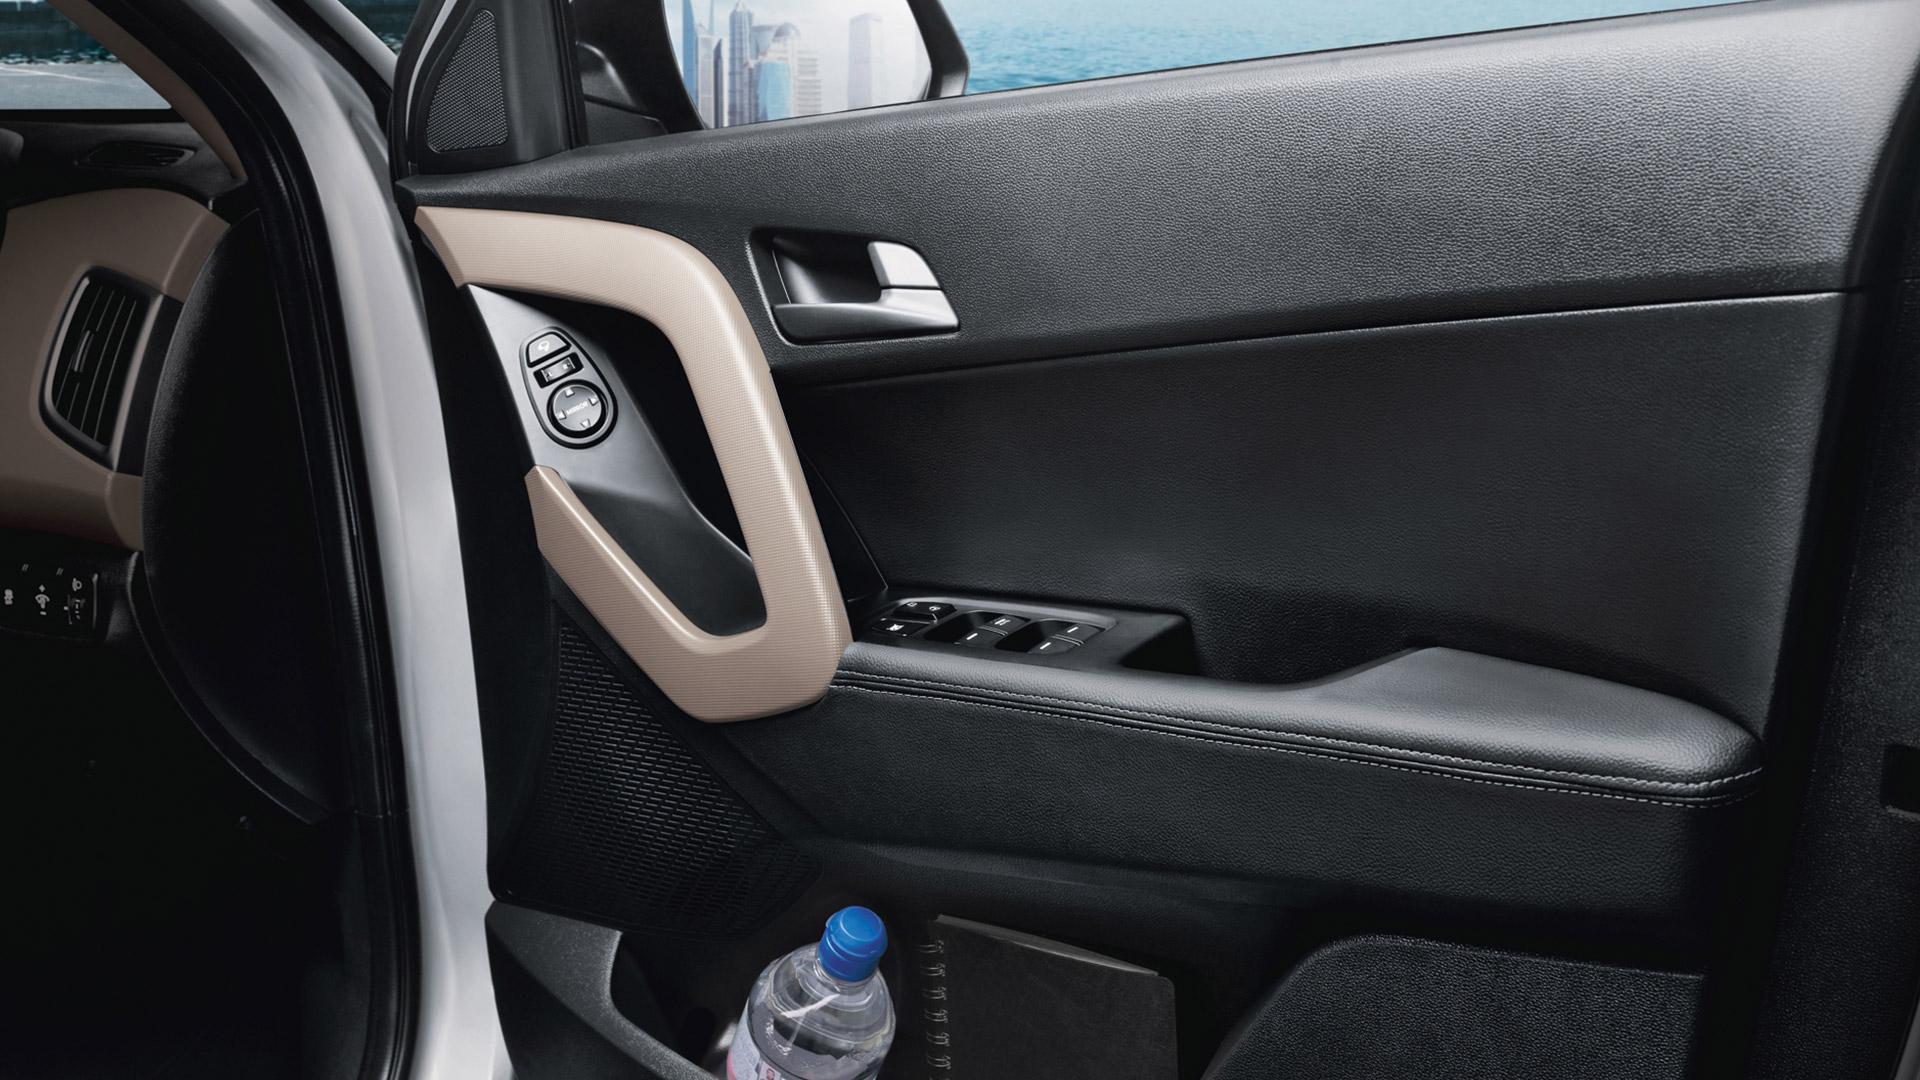 Hyundai Creta 2015 1.6 S Petrol Interior